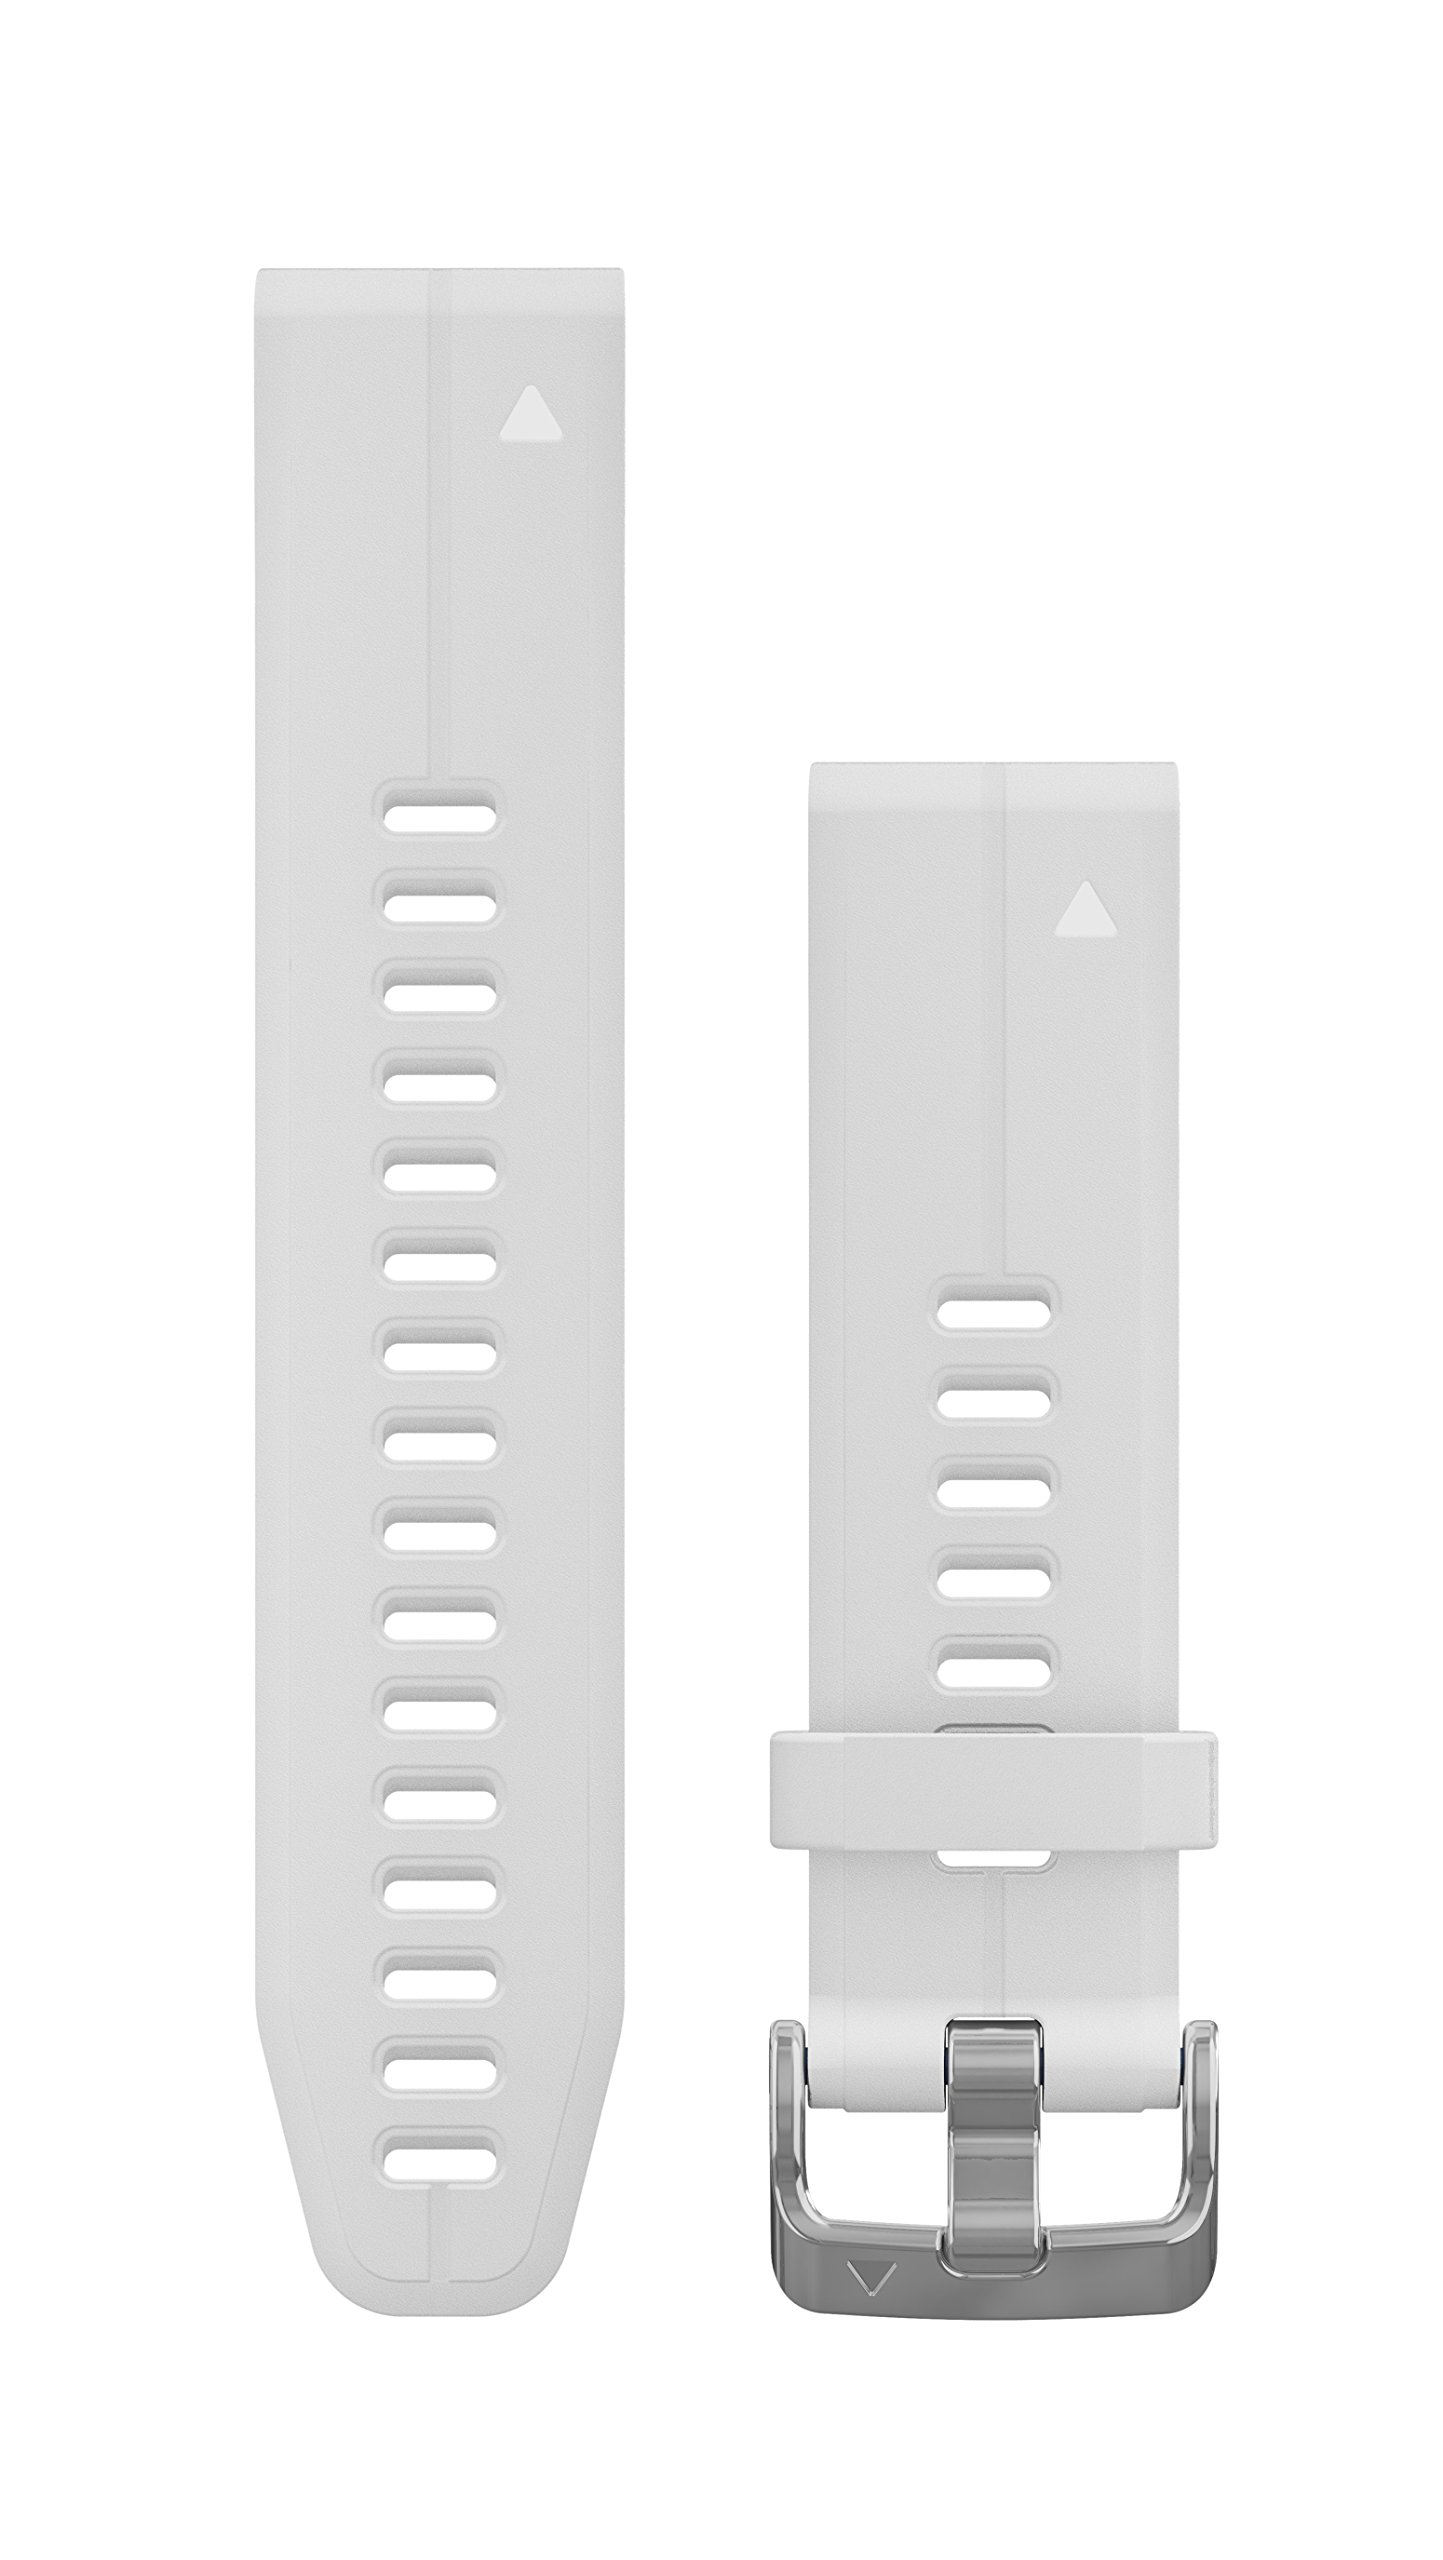 Garmin 010-12739-01 Quickfit 20 Watch Band - Carrara White Silicone - Accessory Band for Fenix 5S Plus/Fenix 5S